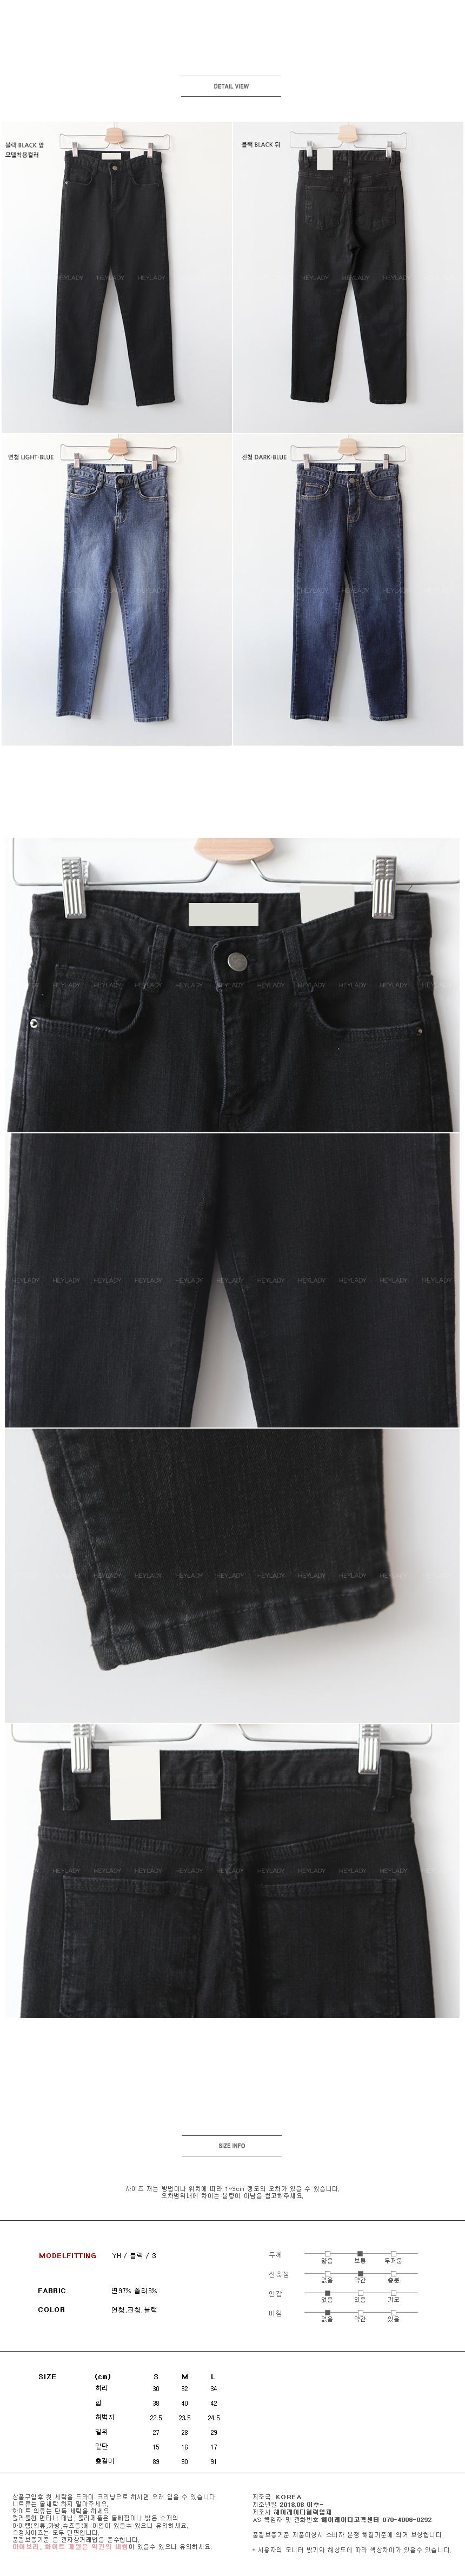 Lop straight denim pants